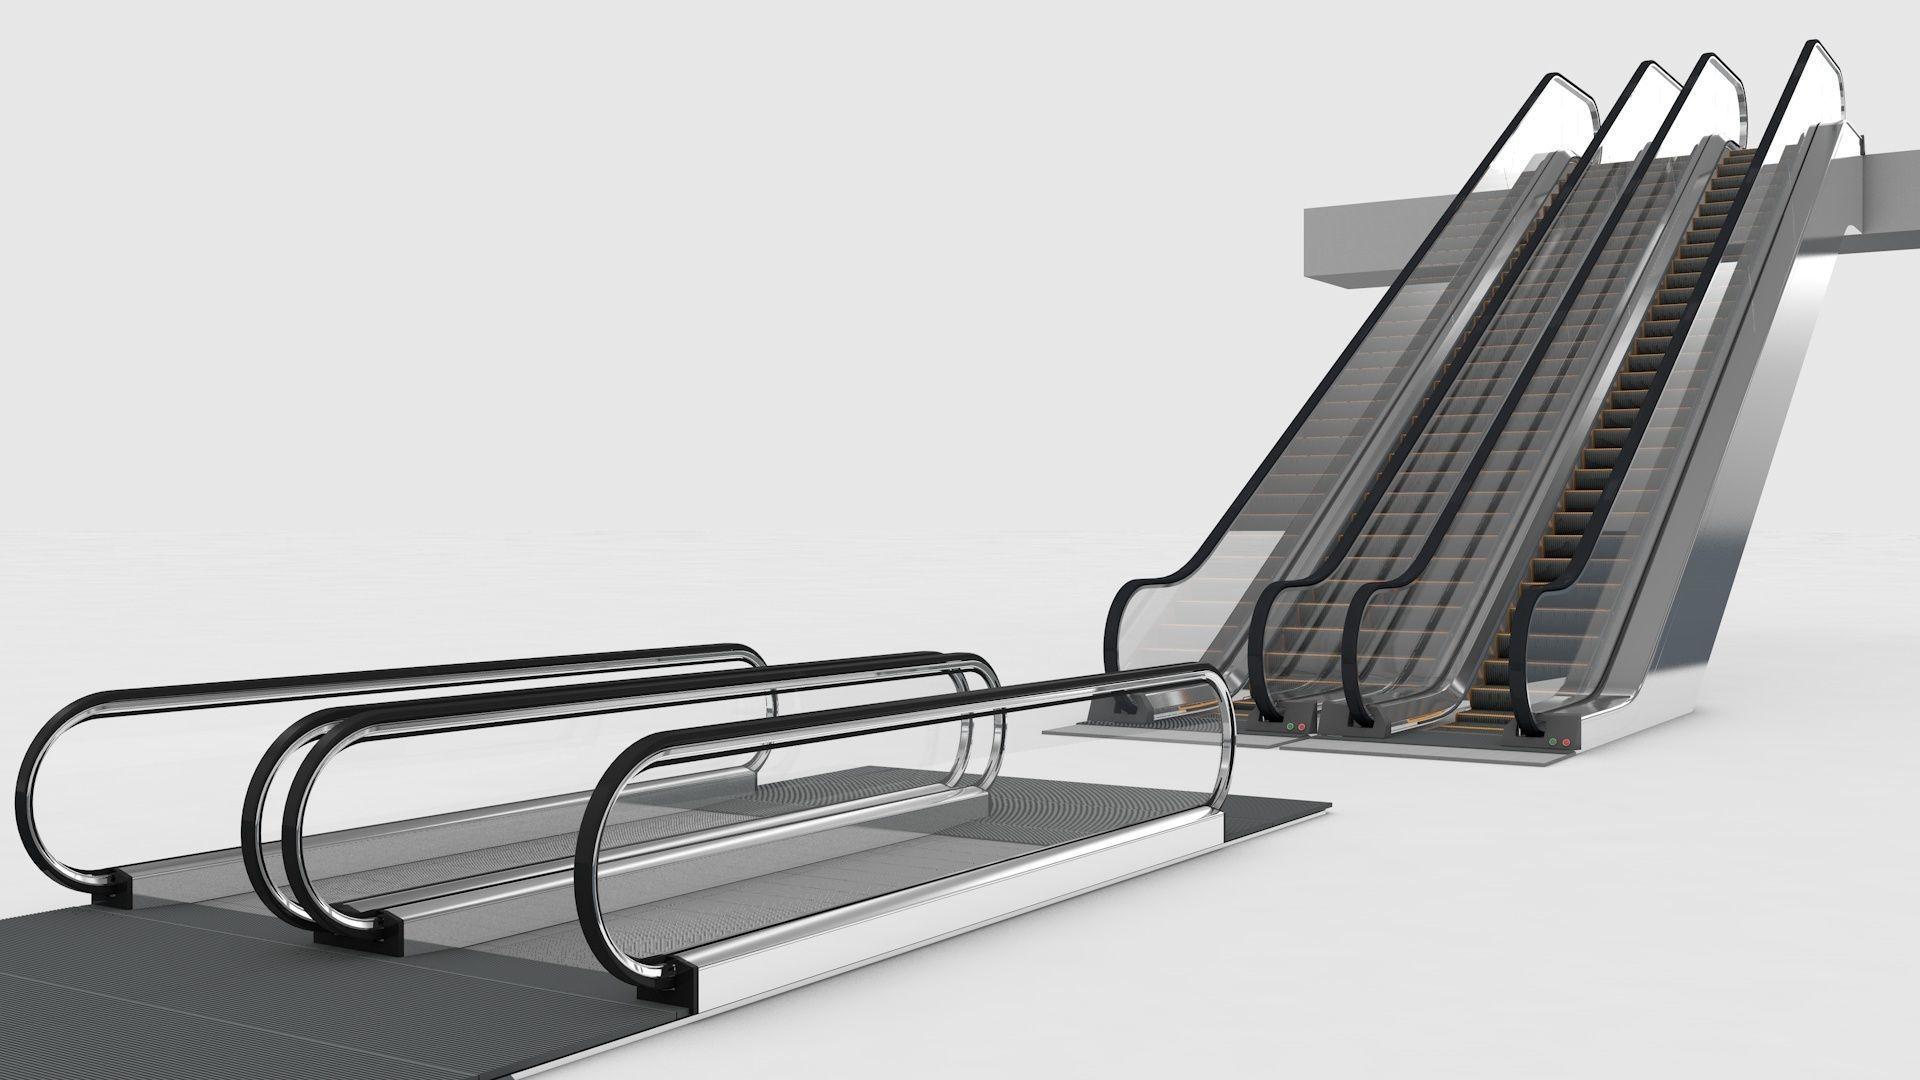 Escalator and Moving Walkway Rigged